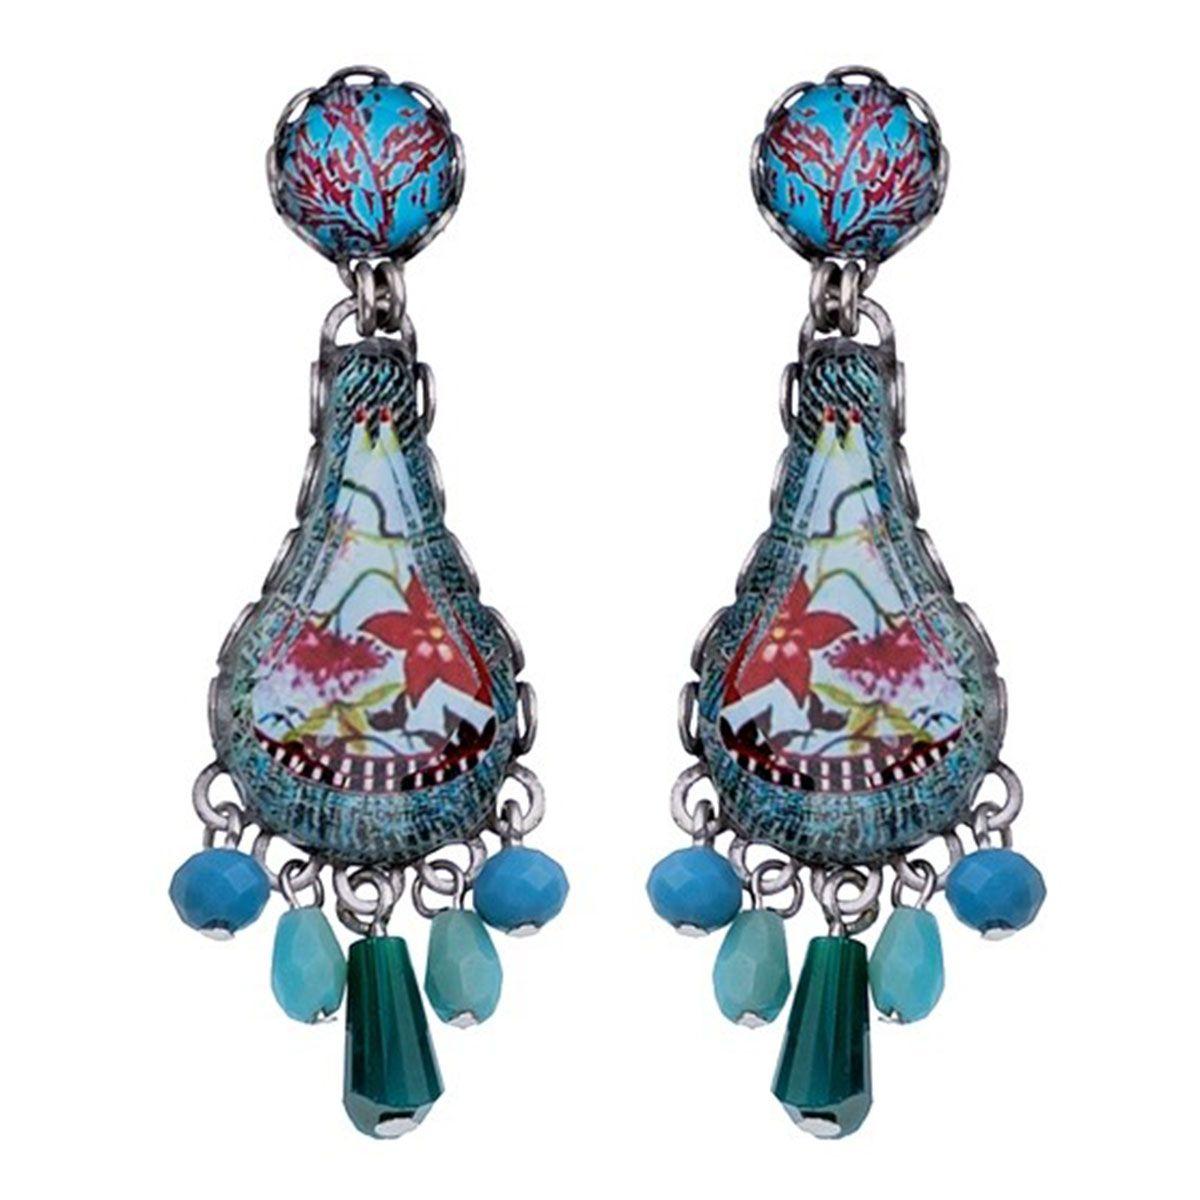 Ayala Bar Israeli Jewelry - Astral Light Abigail Post Earrings -  Fall/Winter 2018